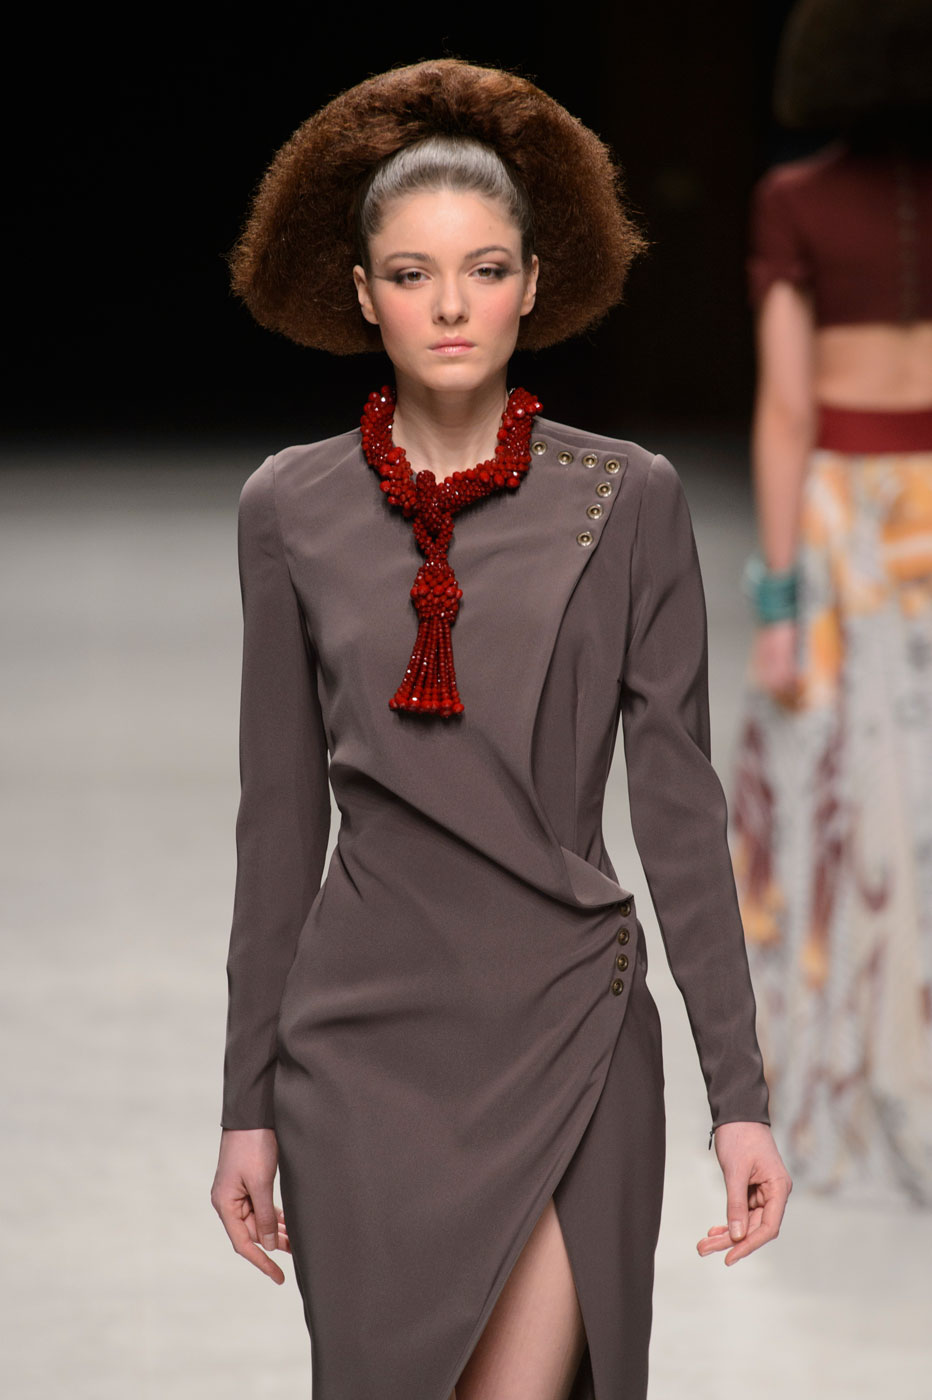 Julien-Fournie-Prive-fashion-runway-show-haute-couture-paris-spring-2015-the-impression-19